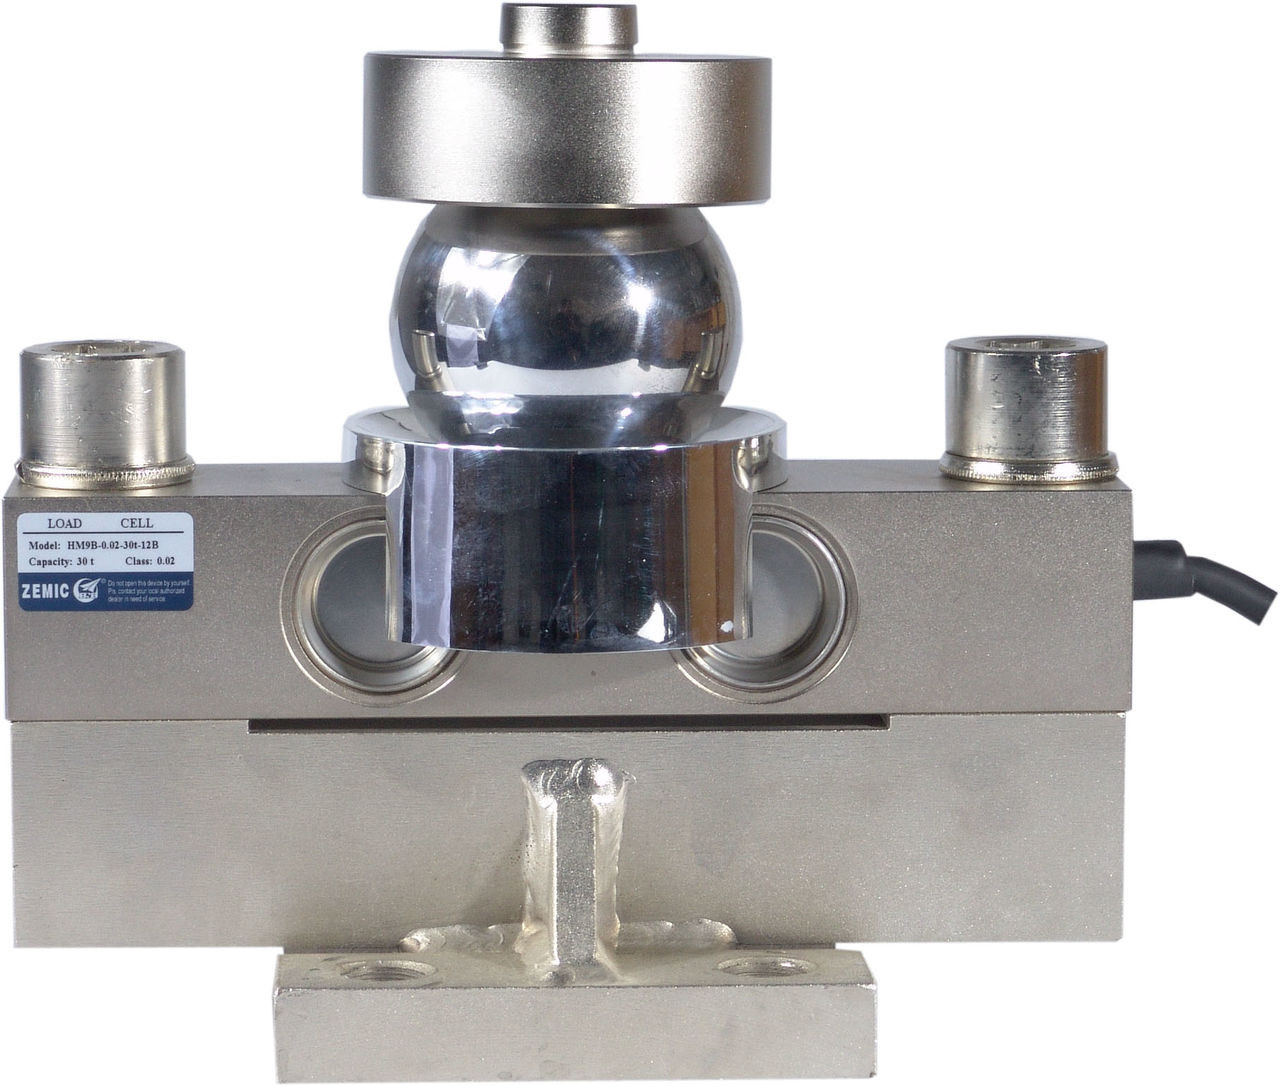 Тензометрический датчик Zemic НМ9В-С3-20t-16В